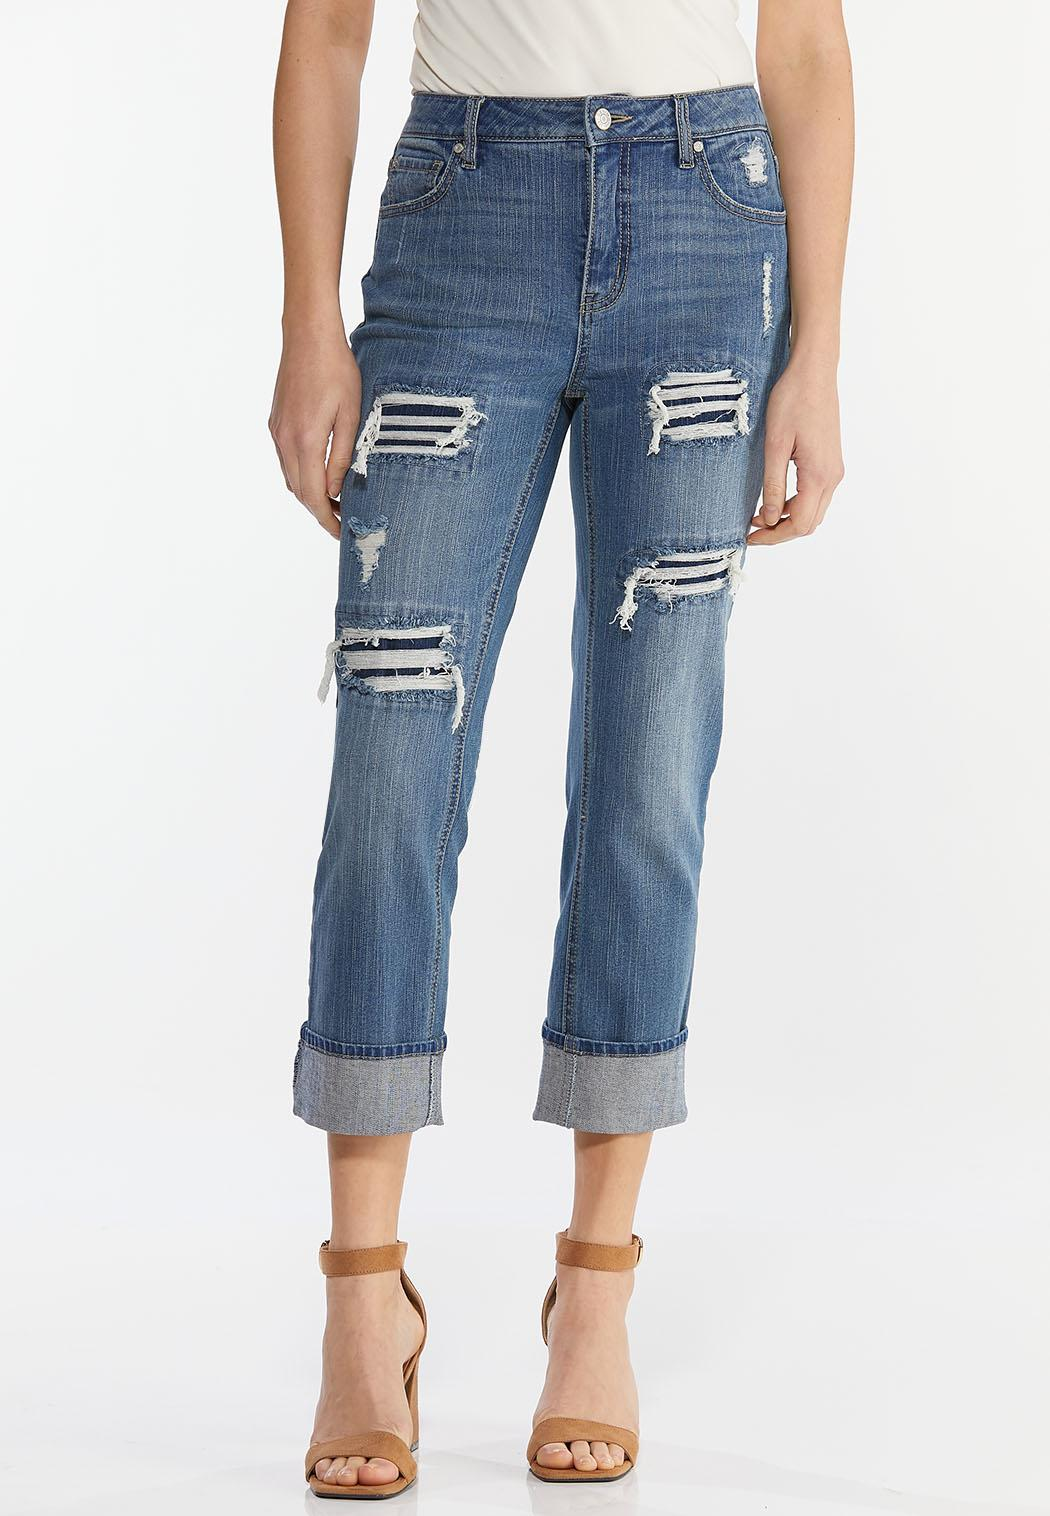 Distressed Boyfriend Jeans (Item #44440595)